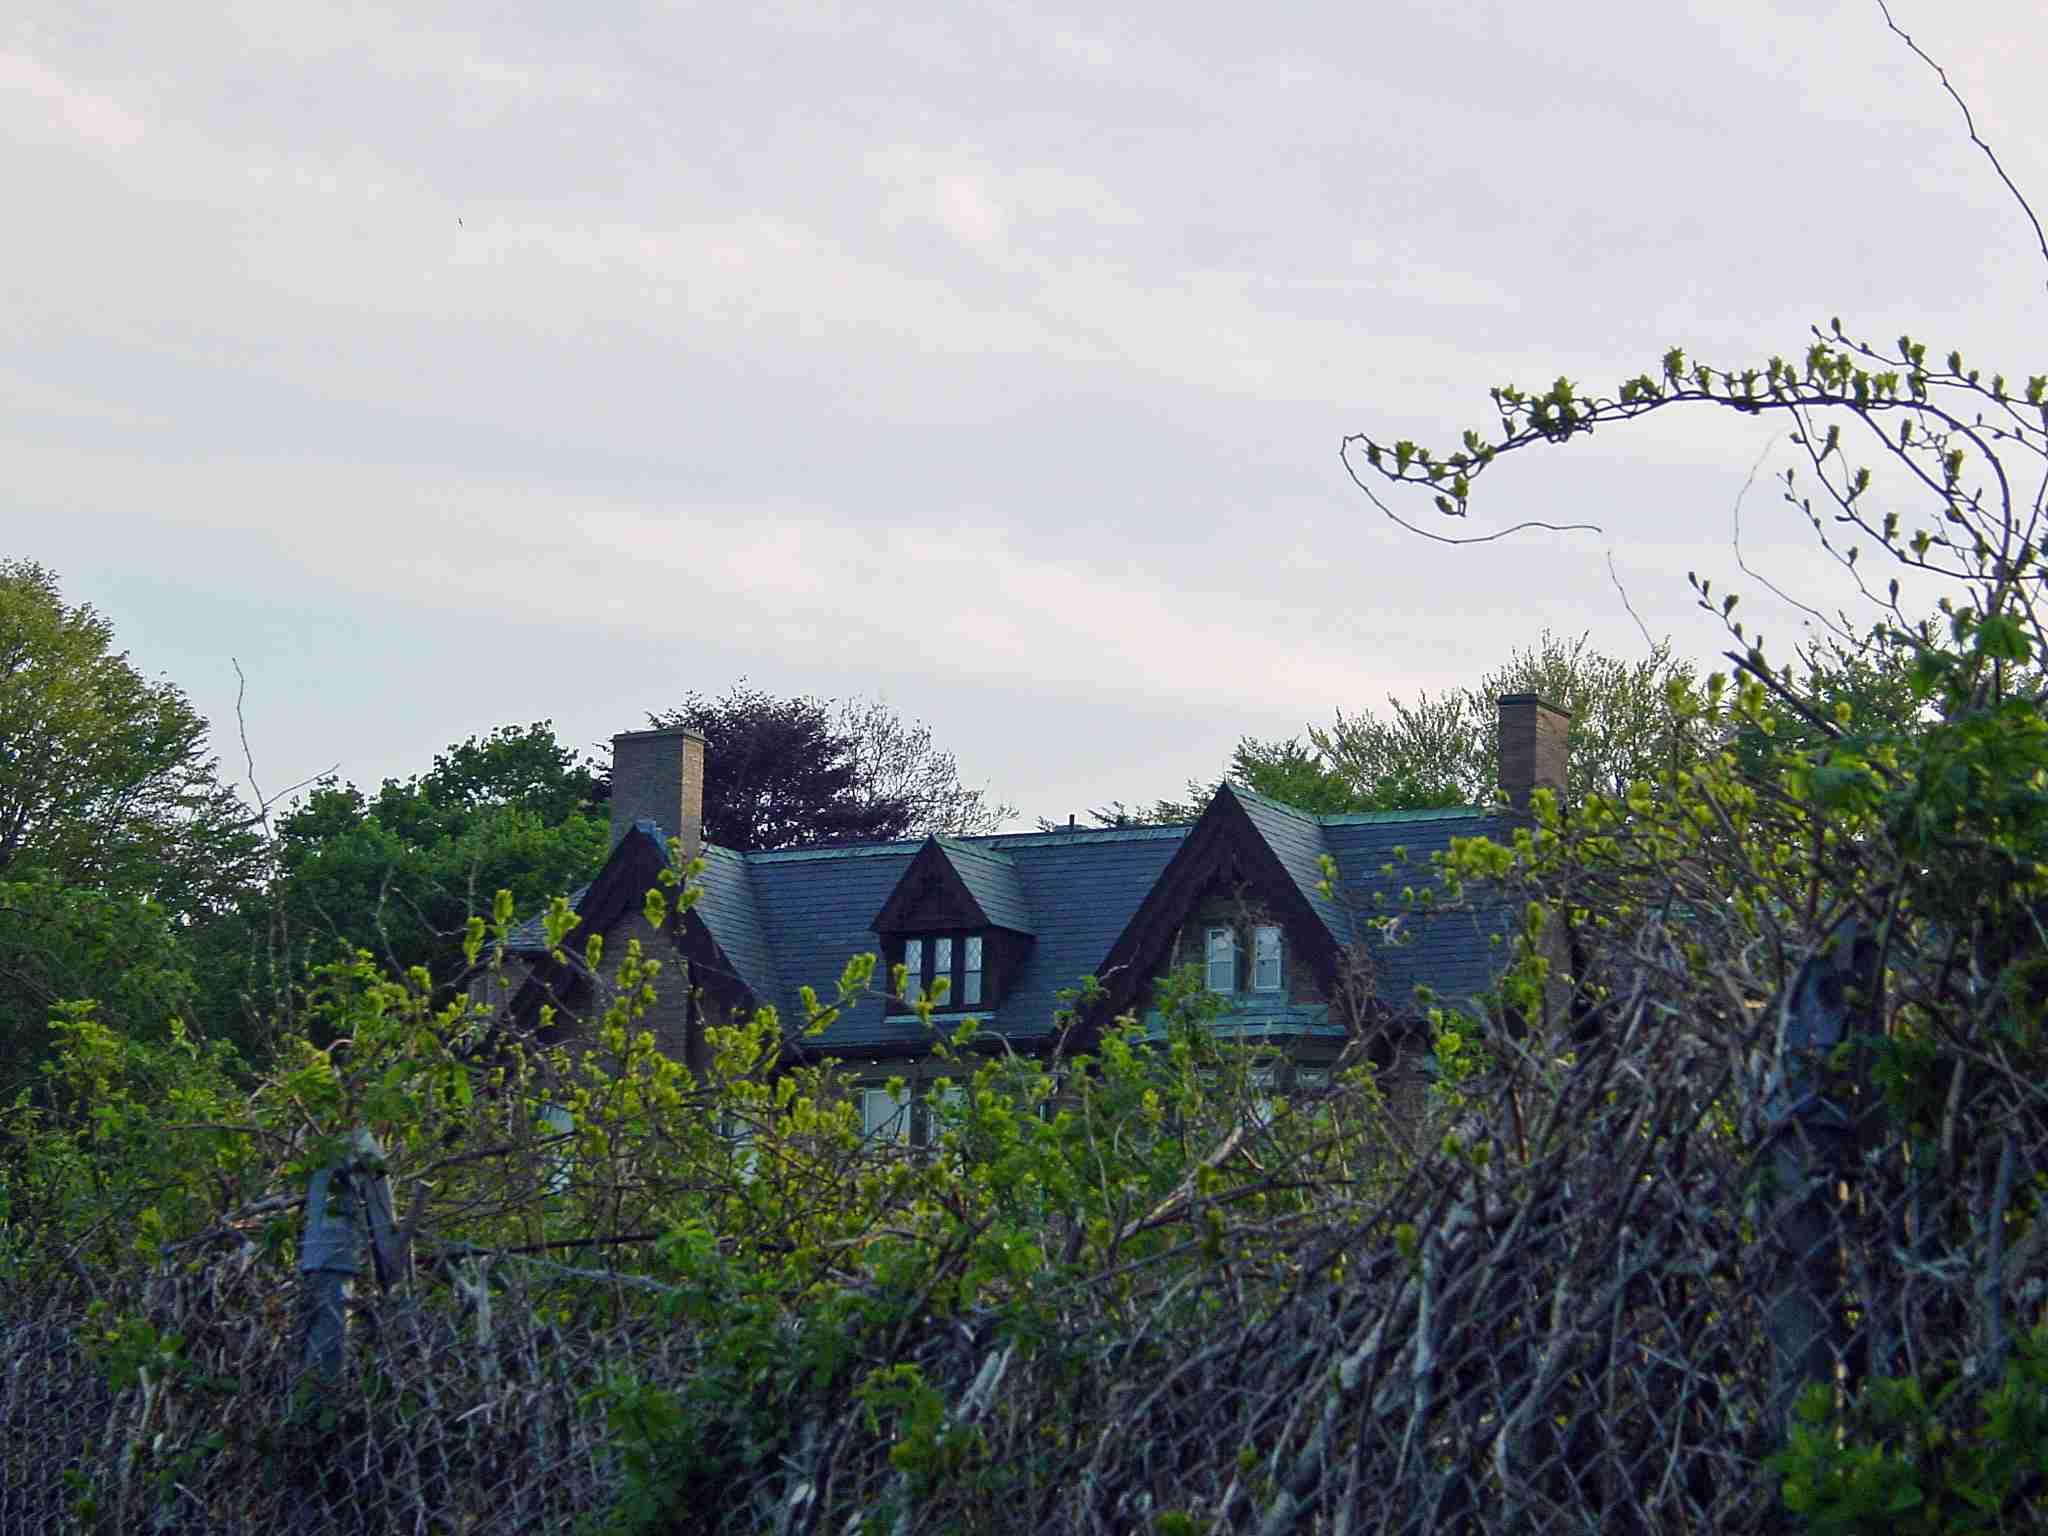 Newport Cliff Walk Public Right-of-Way Crosses Private Properties